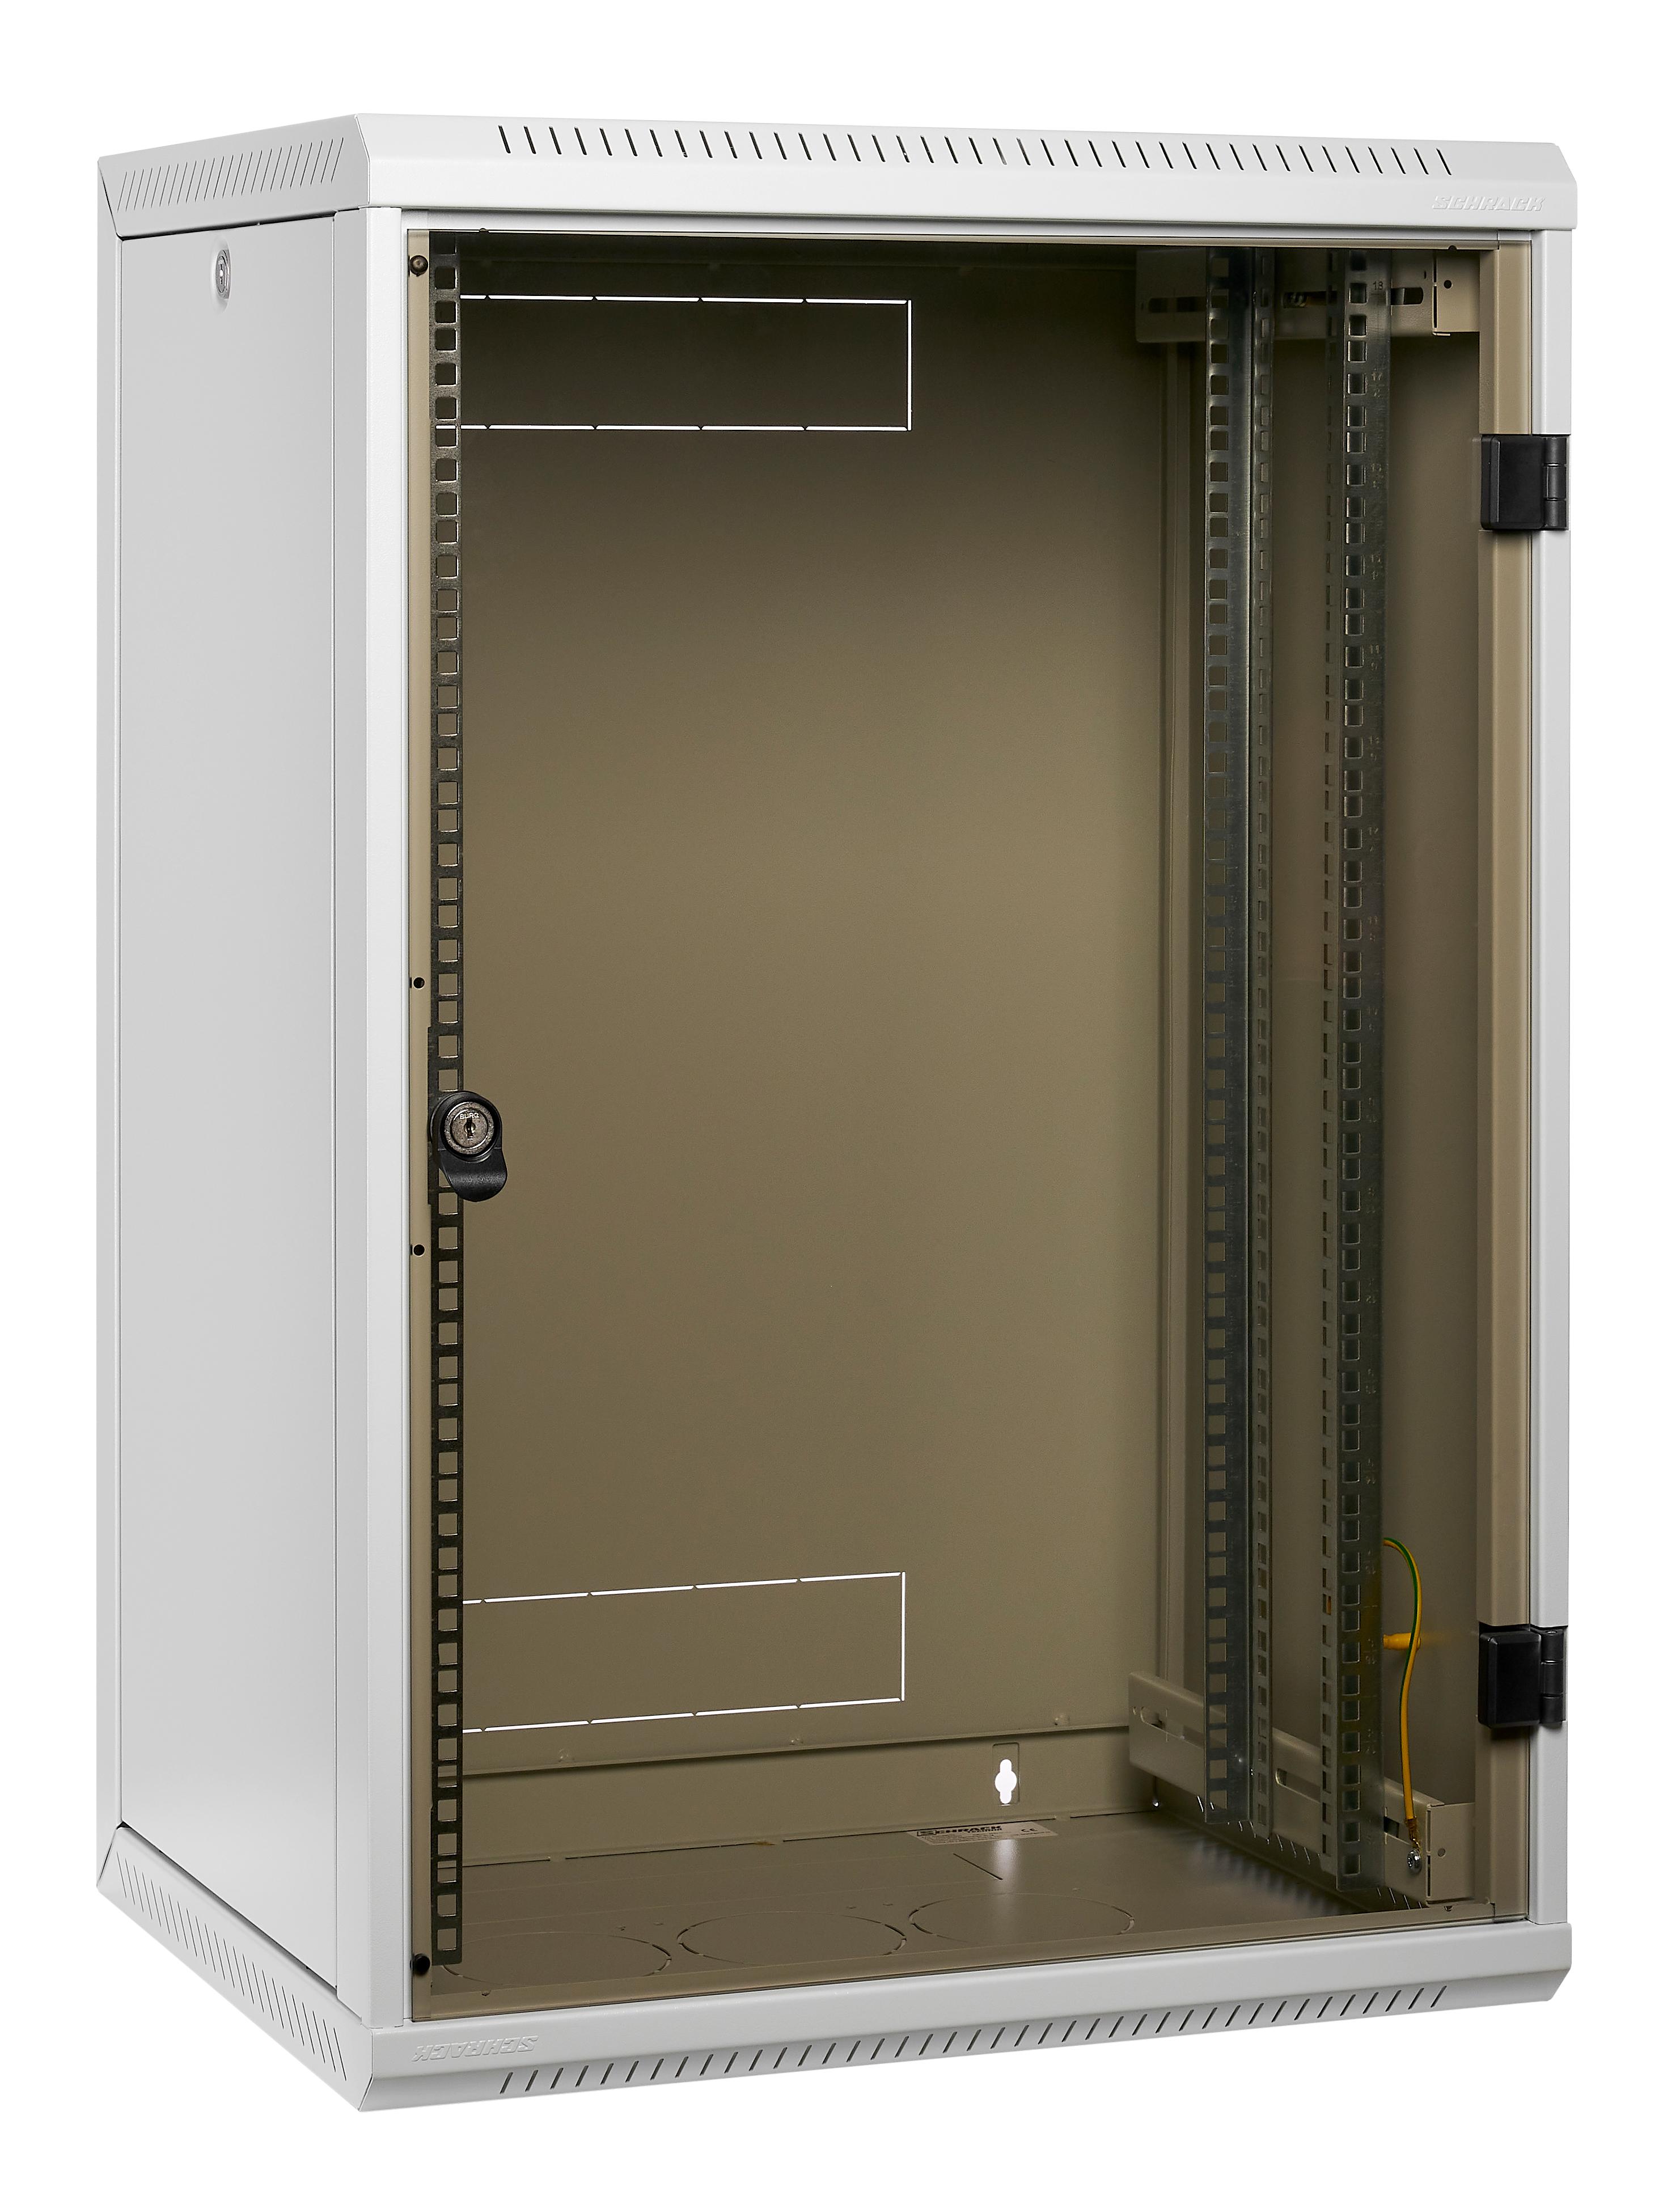 1 Stk Netzwerk-Wandschrank DW Monoblock, B600xH635xT495, 19,12HE DW126050--